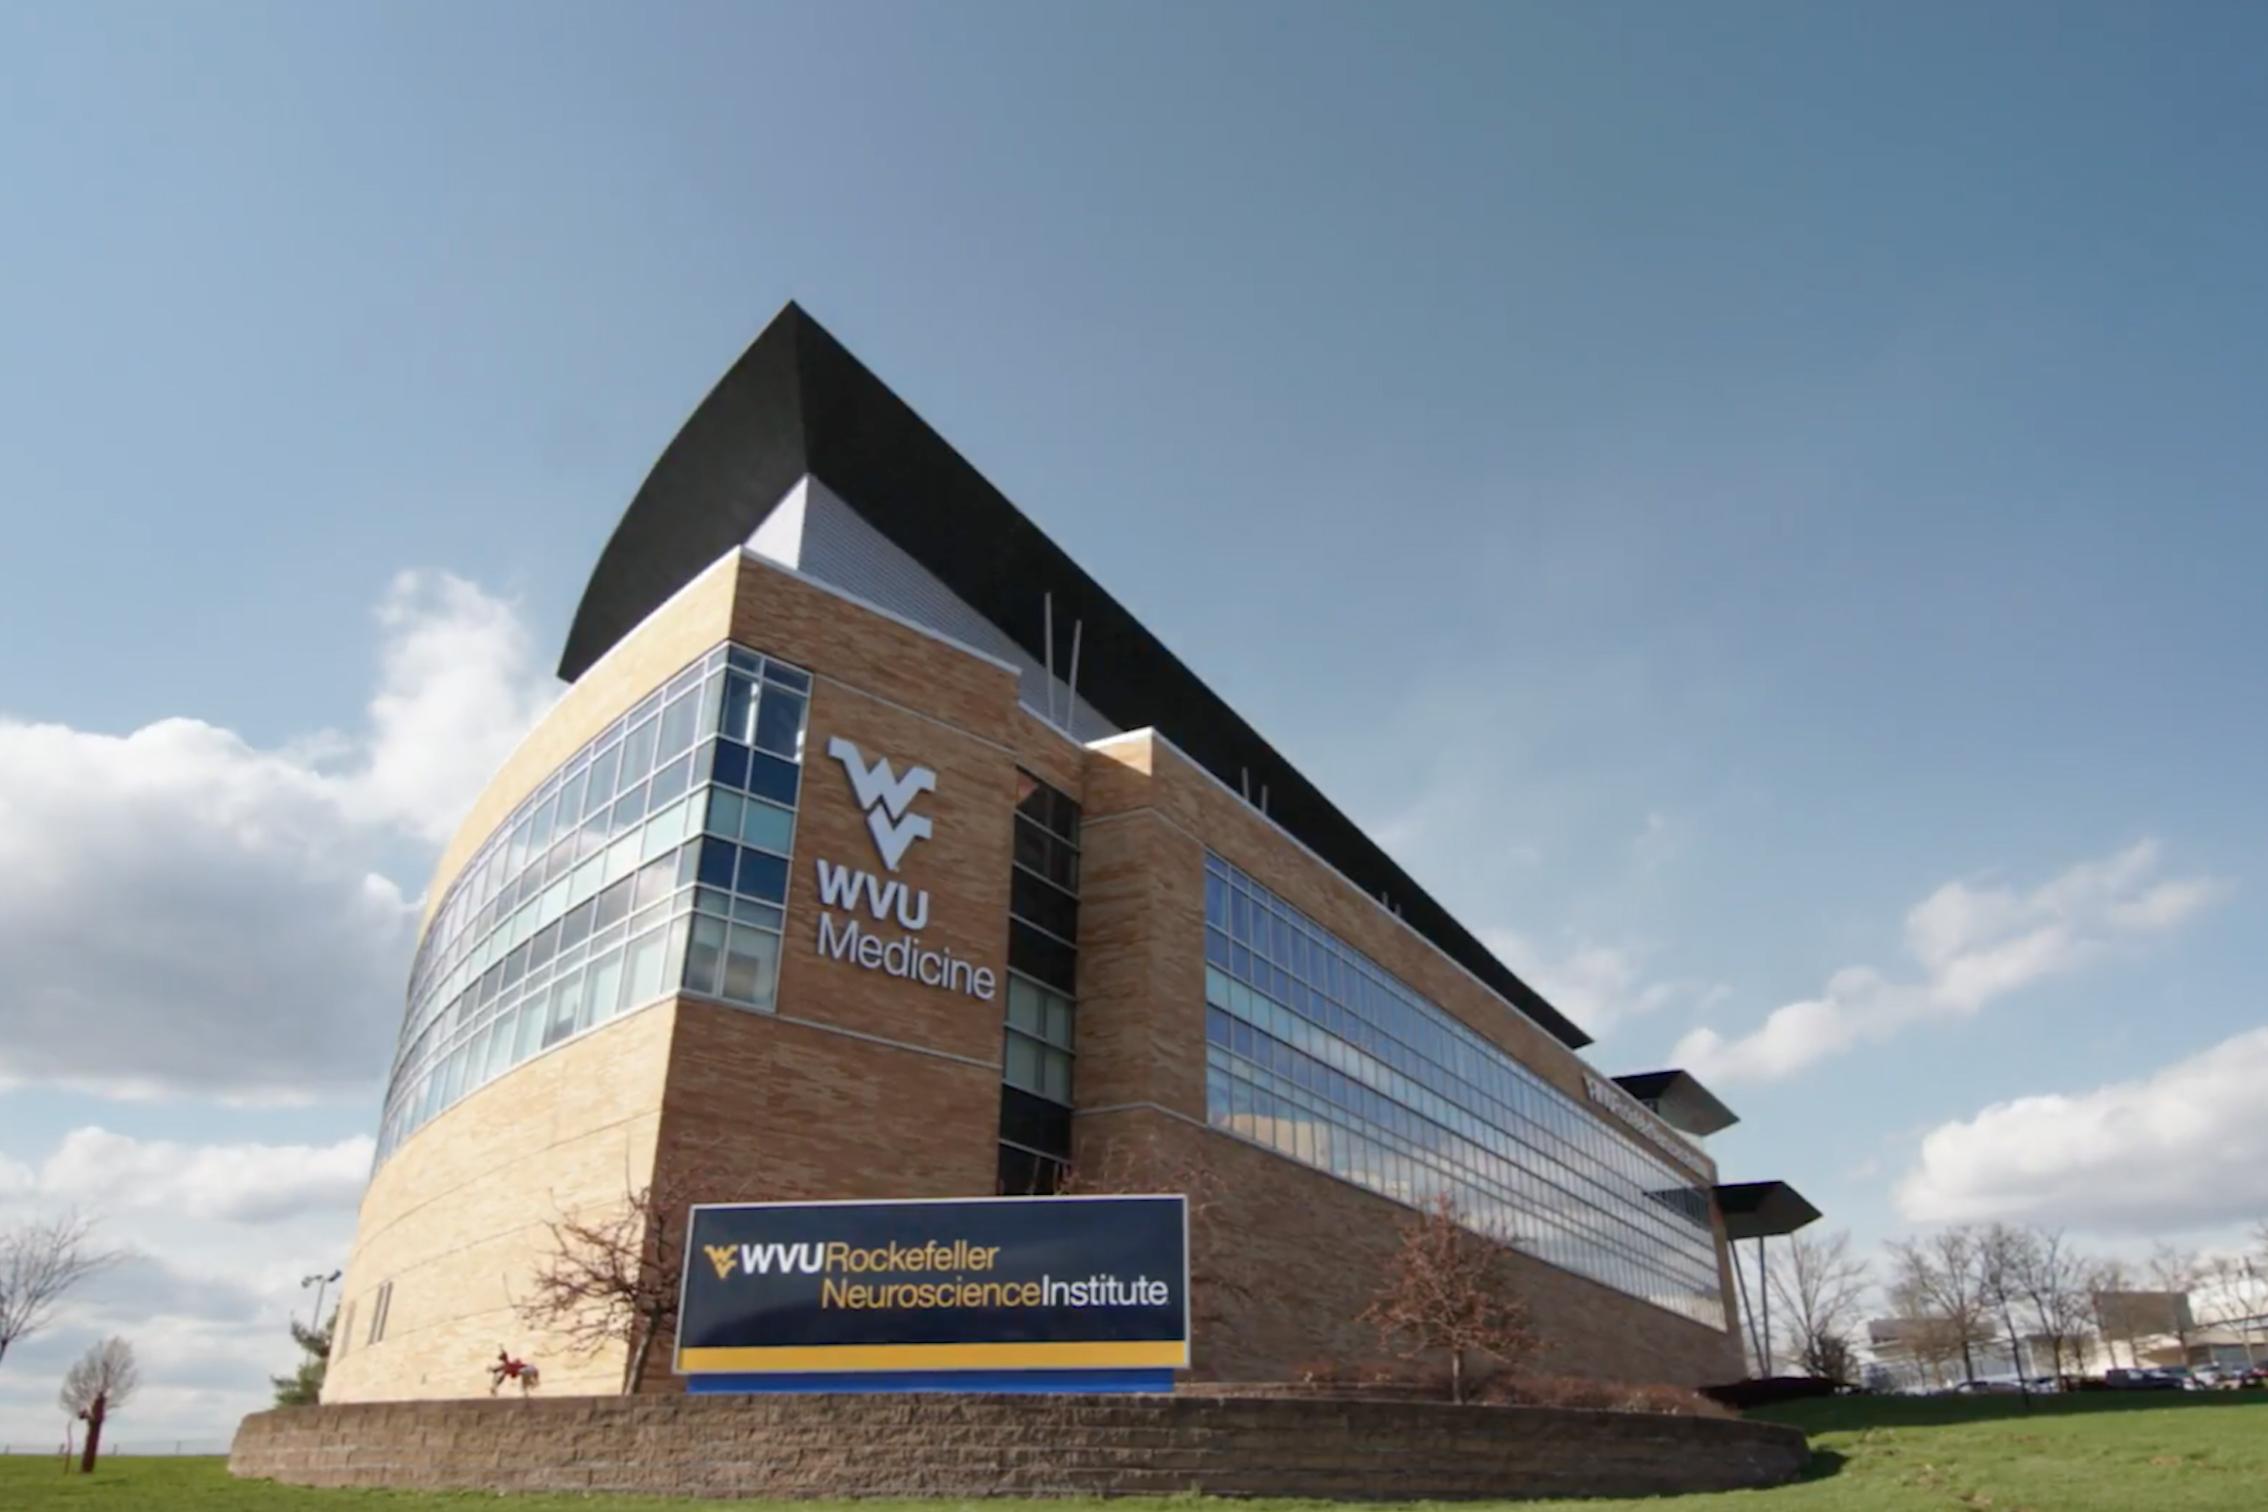 WVU Rockefeller Neuroscience Institute